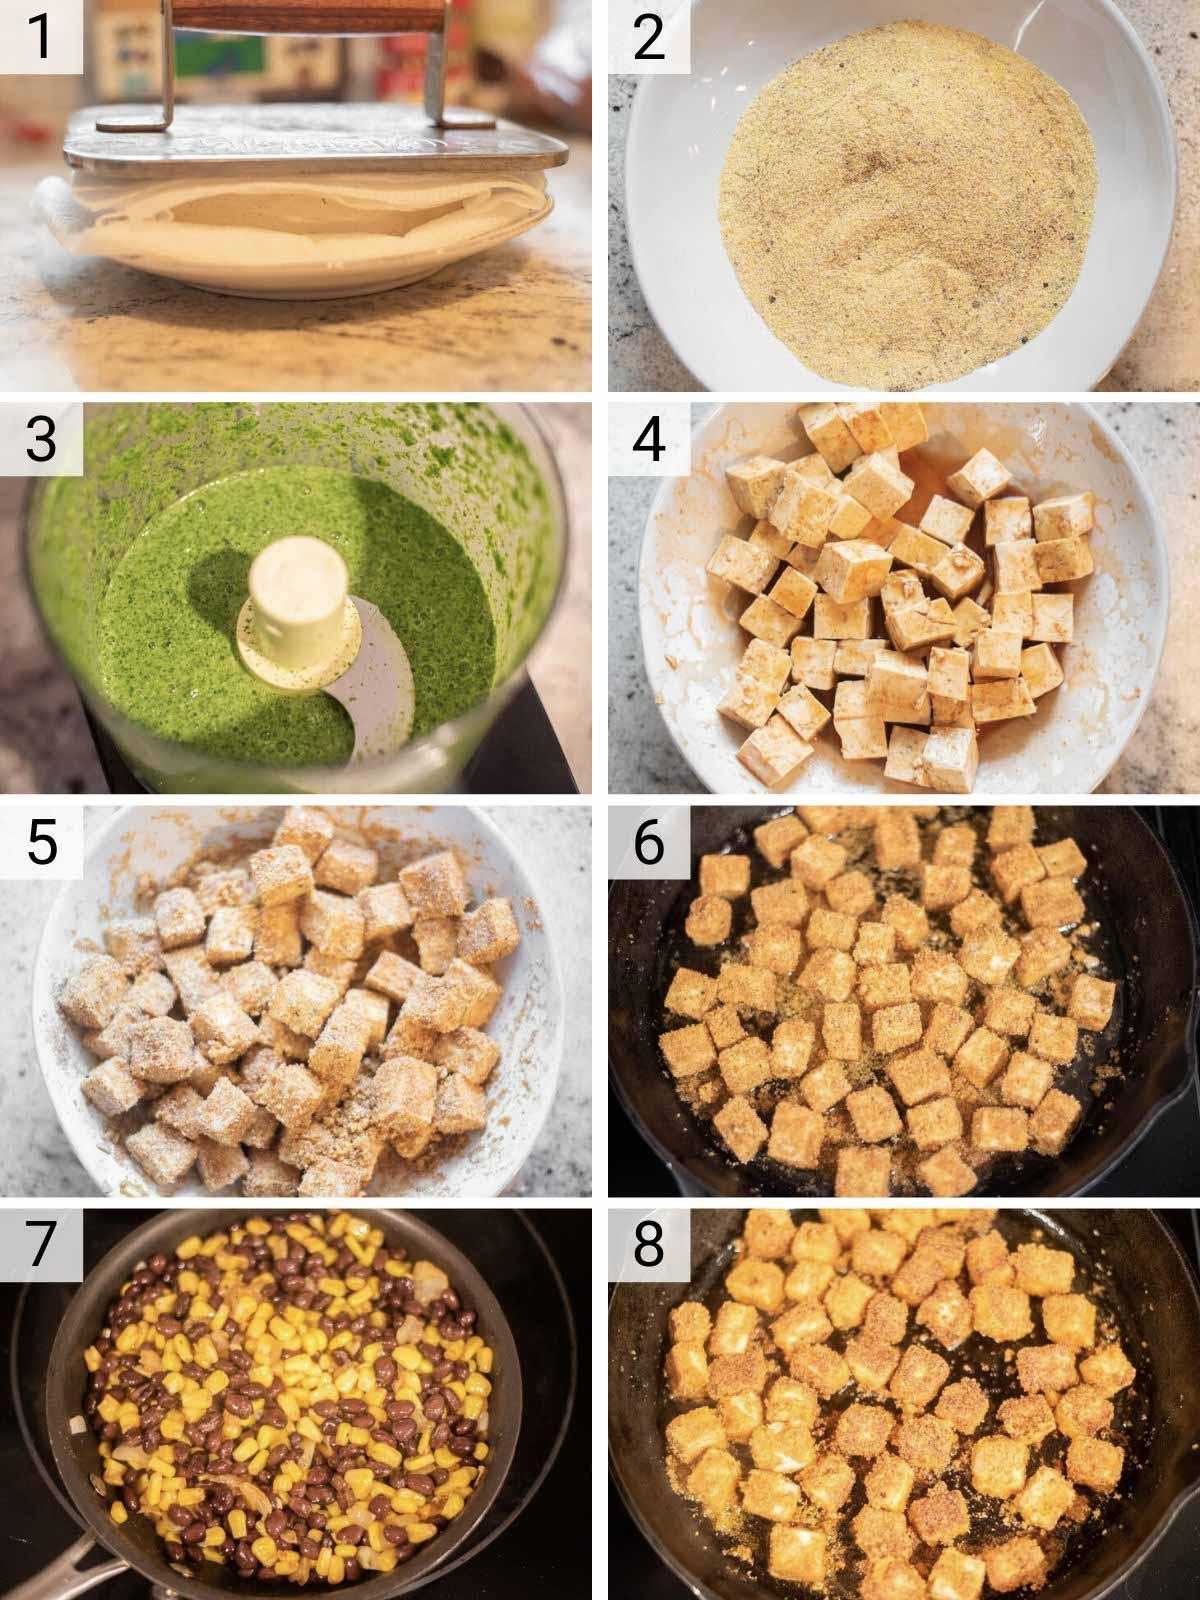 process shots of how to make tofu tacos